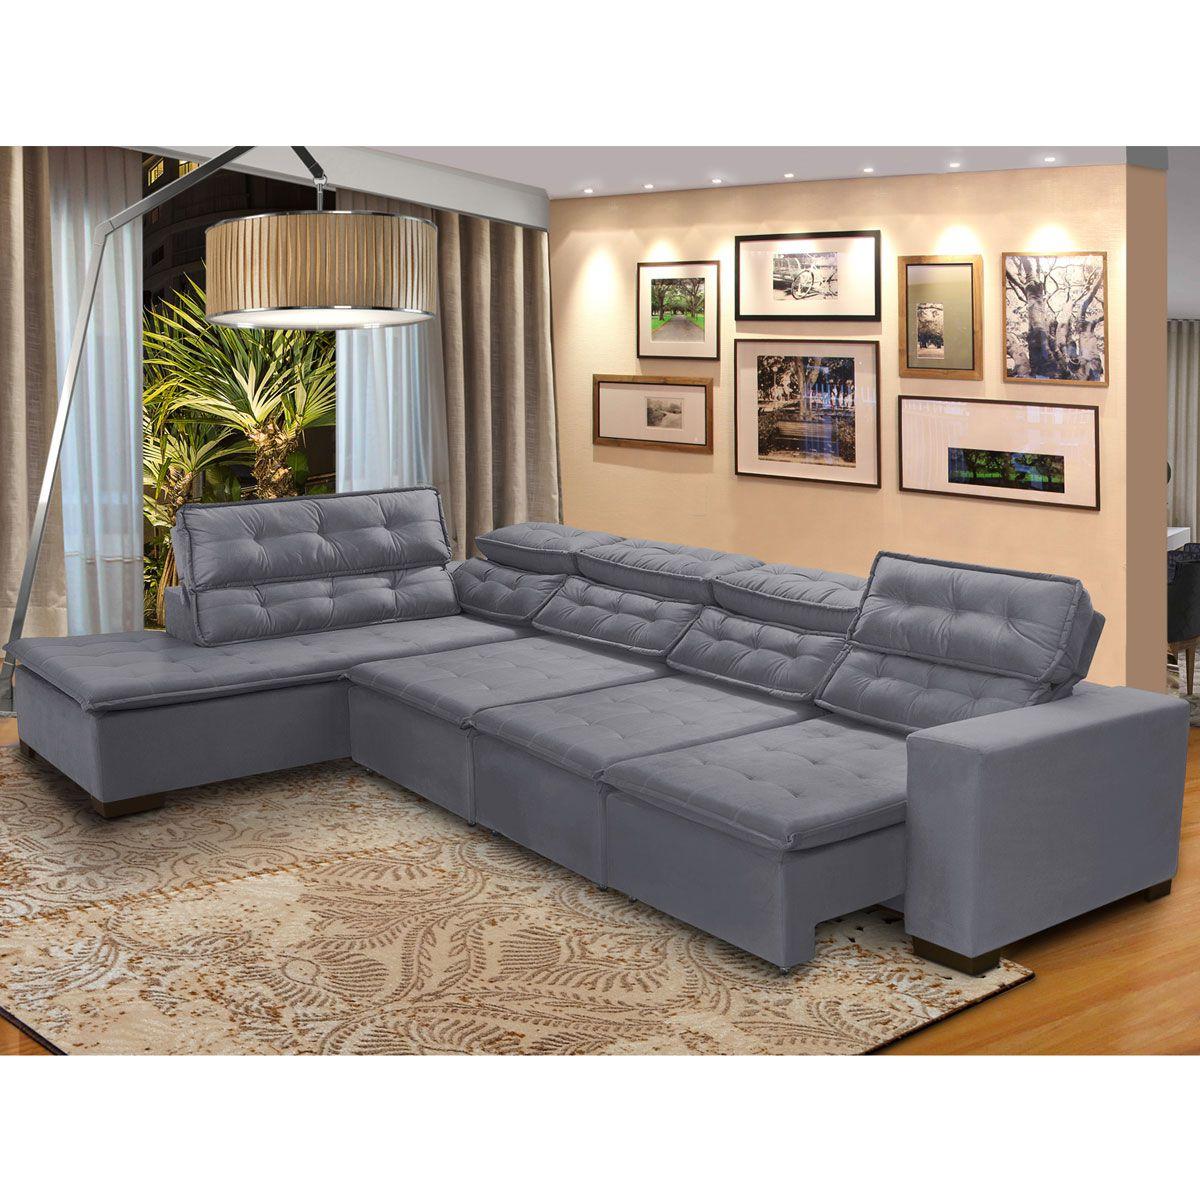 Sofá 7 Lugares de Canto Retrátil Reclinável Pillow Chaise 3,70 x 2,20 m  Sttilo  Cinza - MegaSul